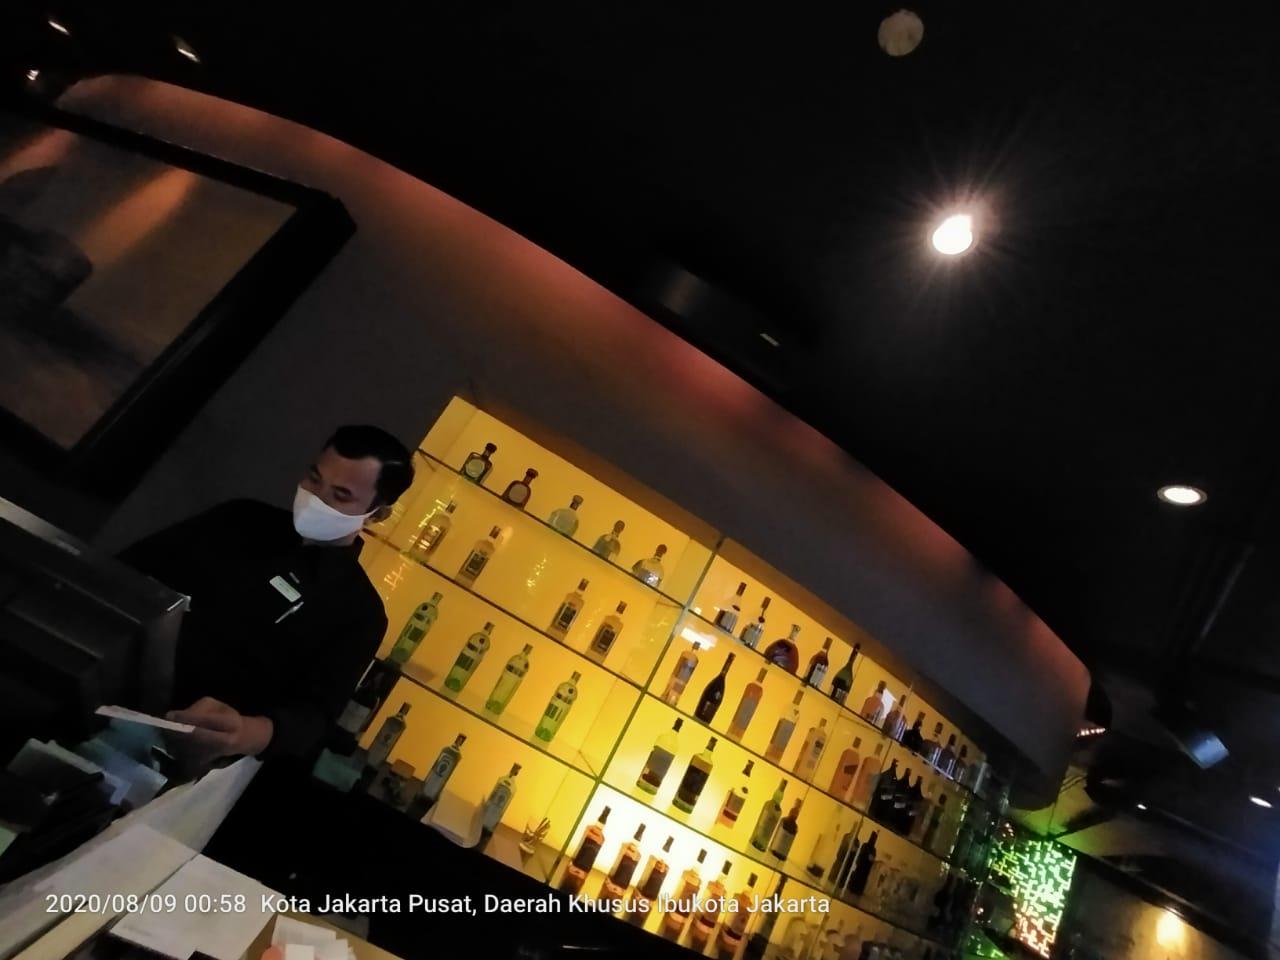 Manajemen Hotel Shangri-La Penuhi Rekomendasi Disparekraf, Tutup B.A.T.S Sport Bar